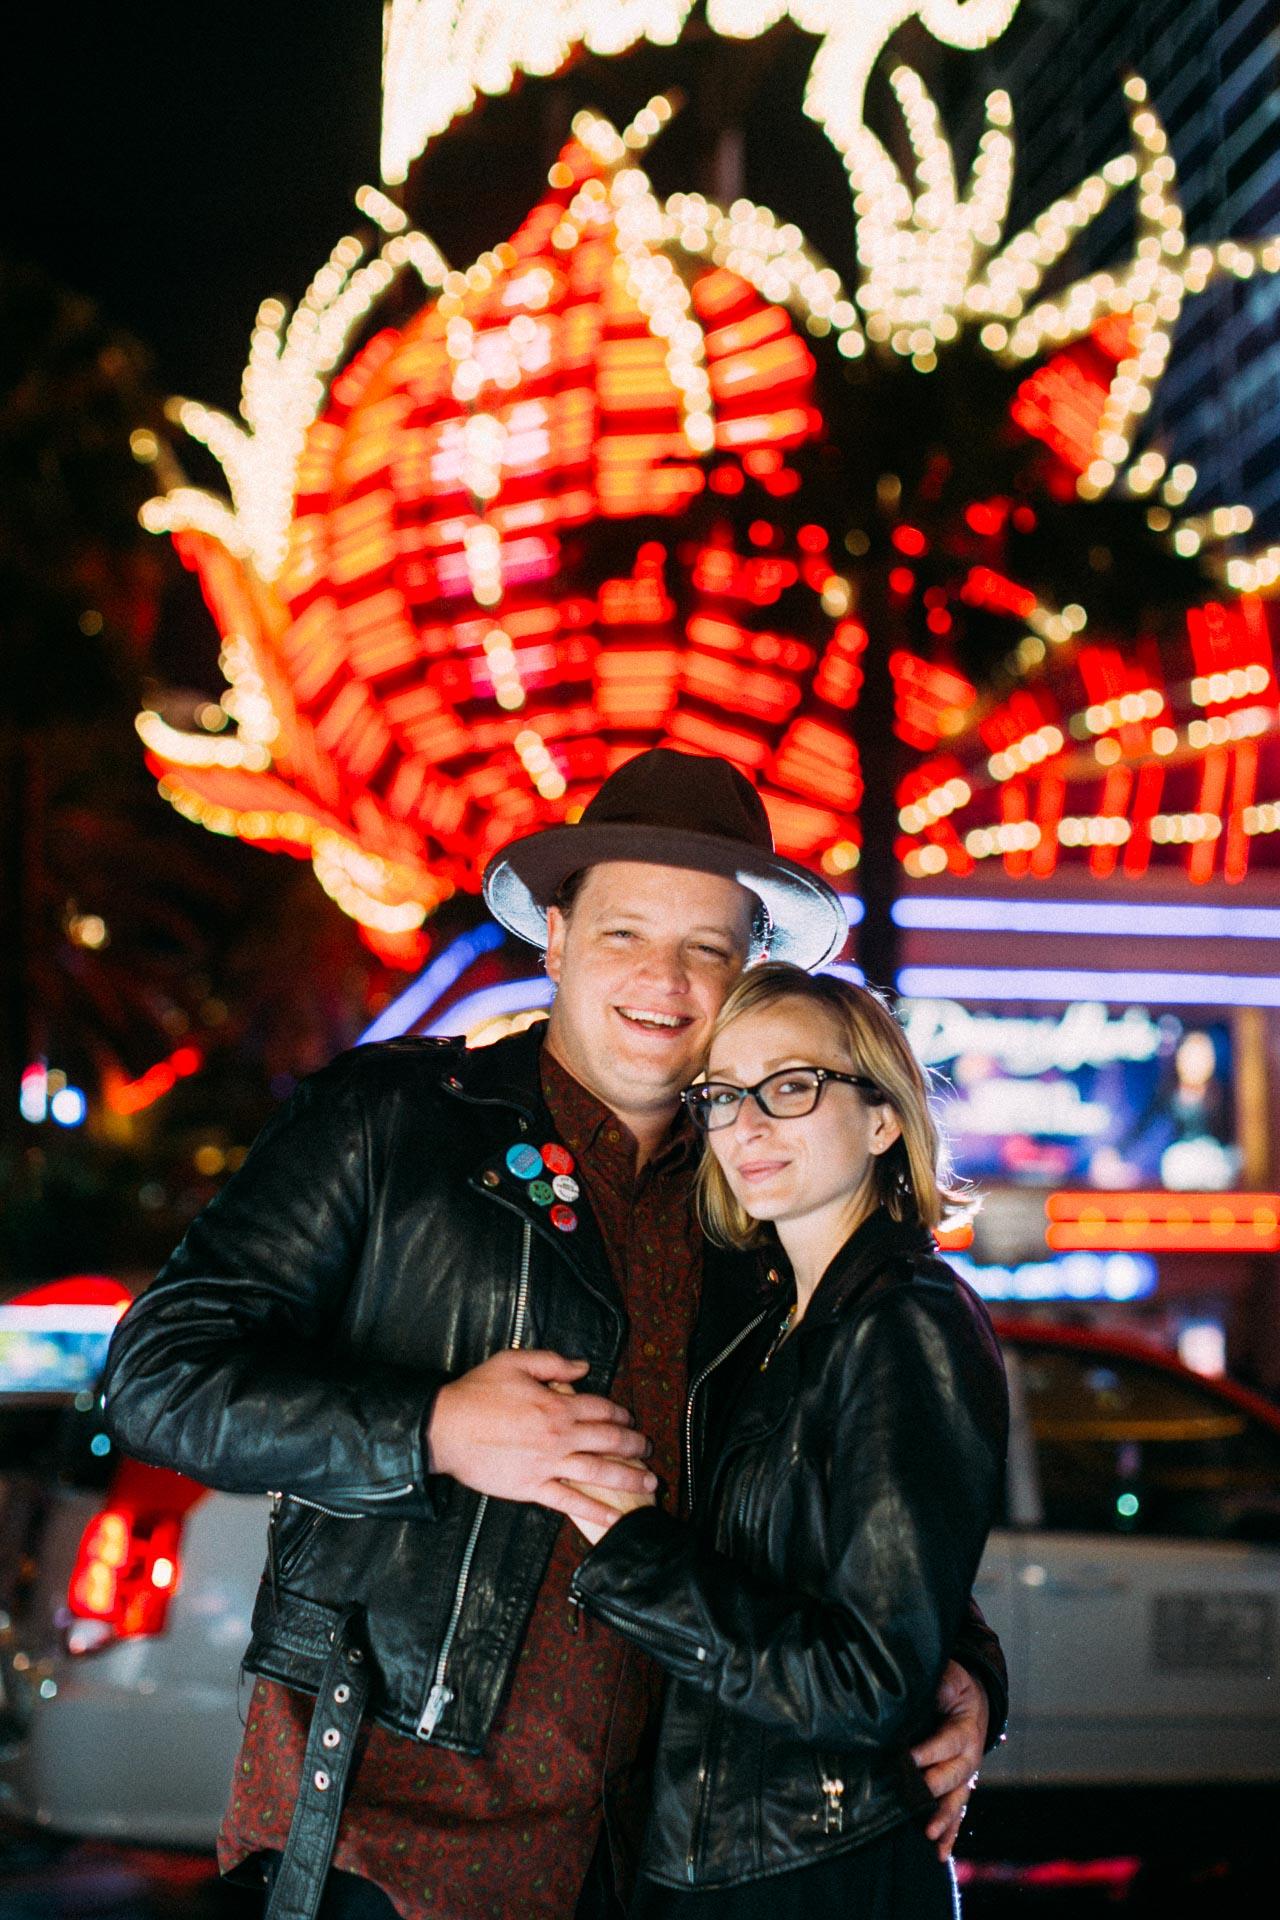 21_GJ_Las_Vegas_Engagment_Photography_.jpg